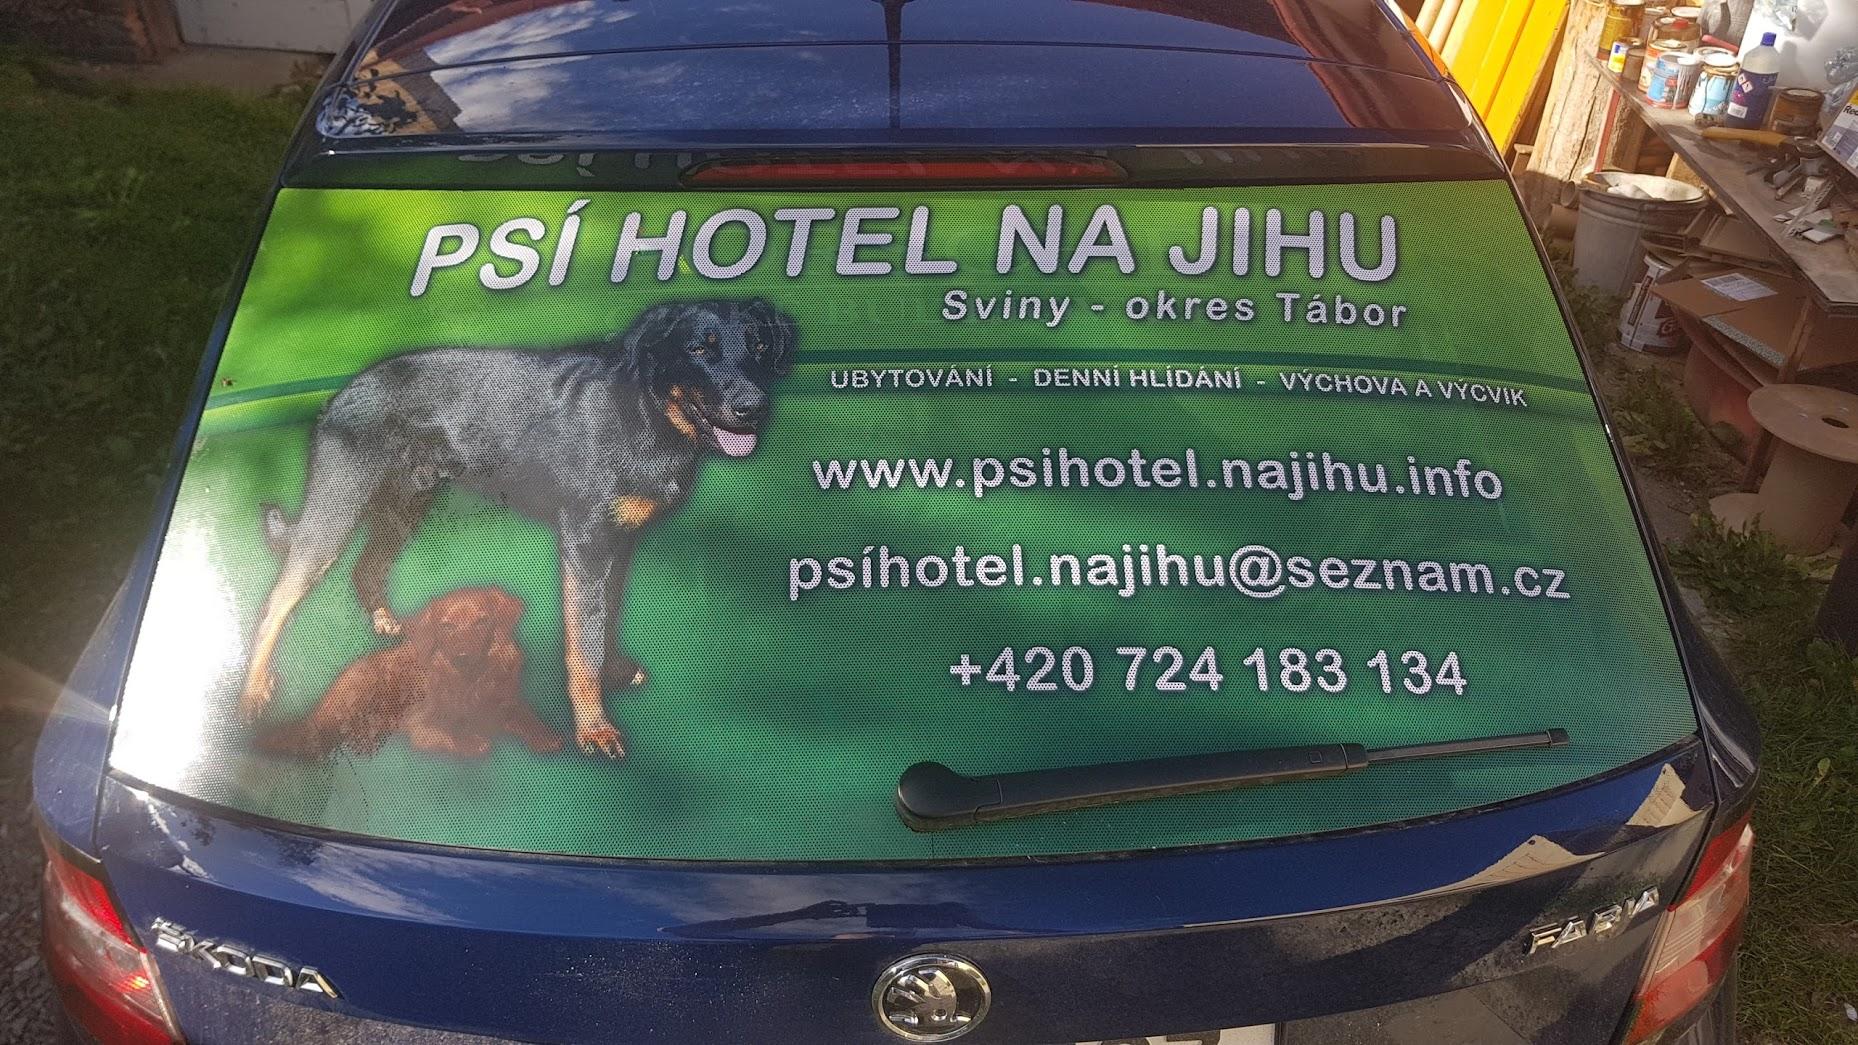 Polep okna Škoda Fabia - Psí hotel na jihu